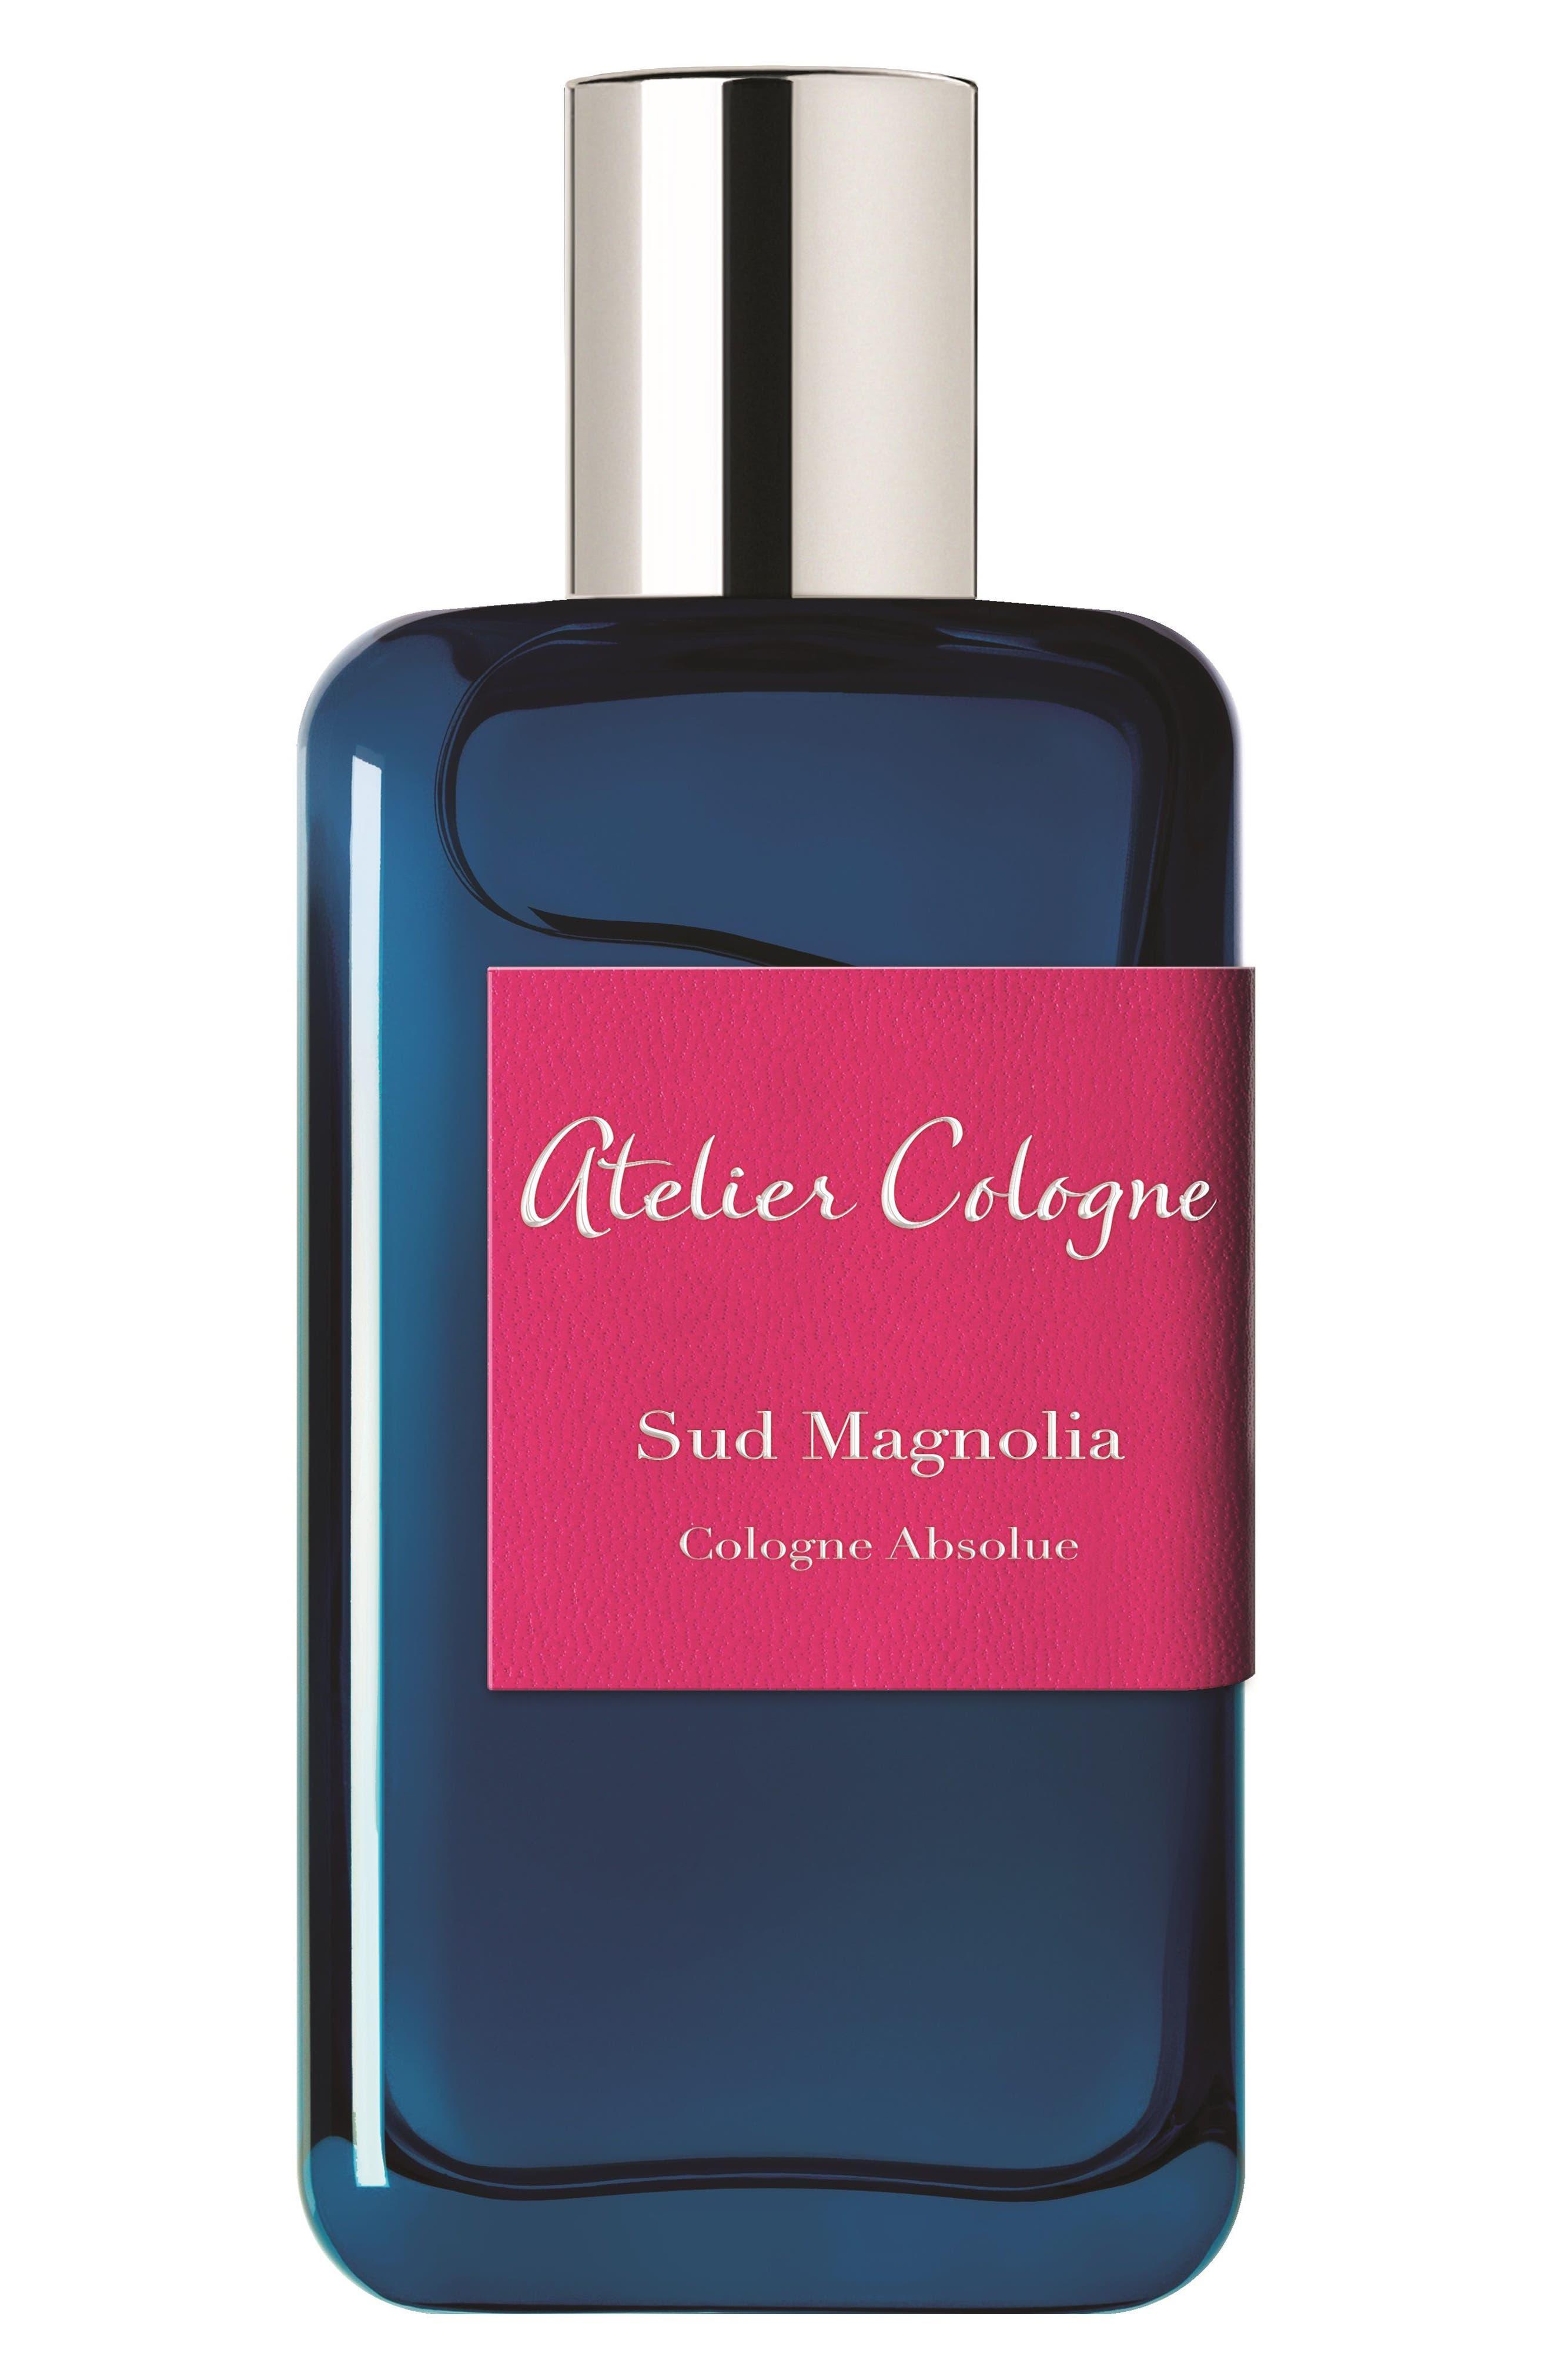 Sud Magnolia Cologne Absolue,                             Main thumbnail 1, color,                             No Color